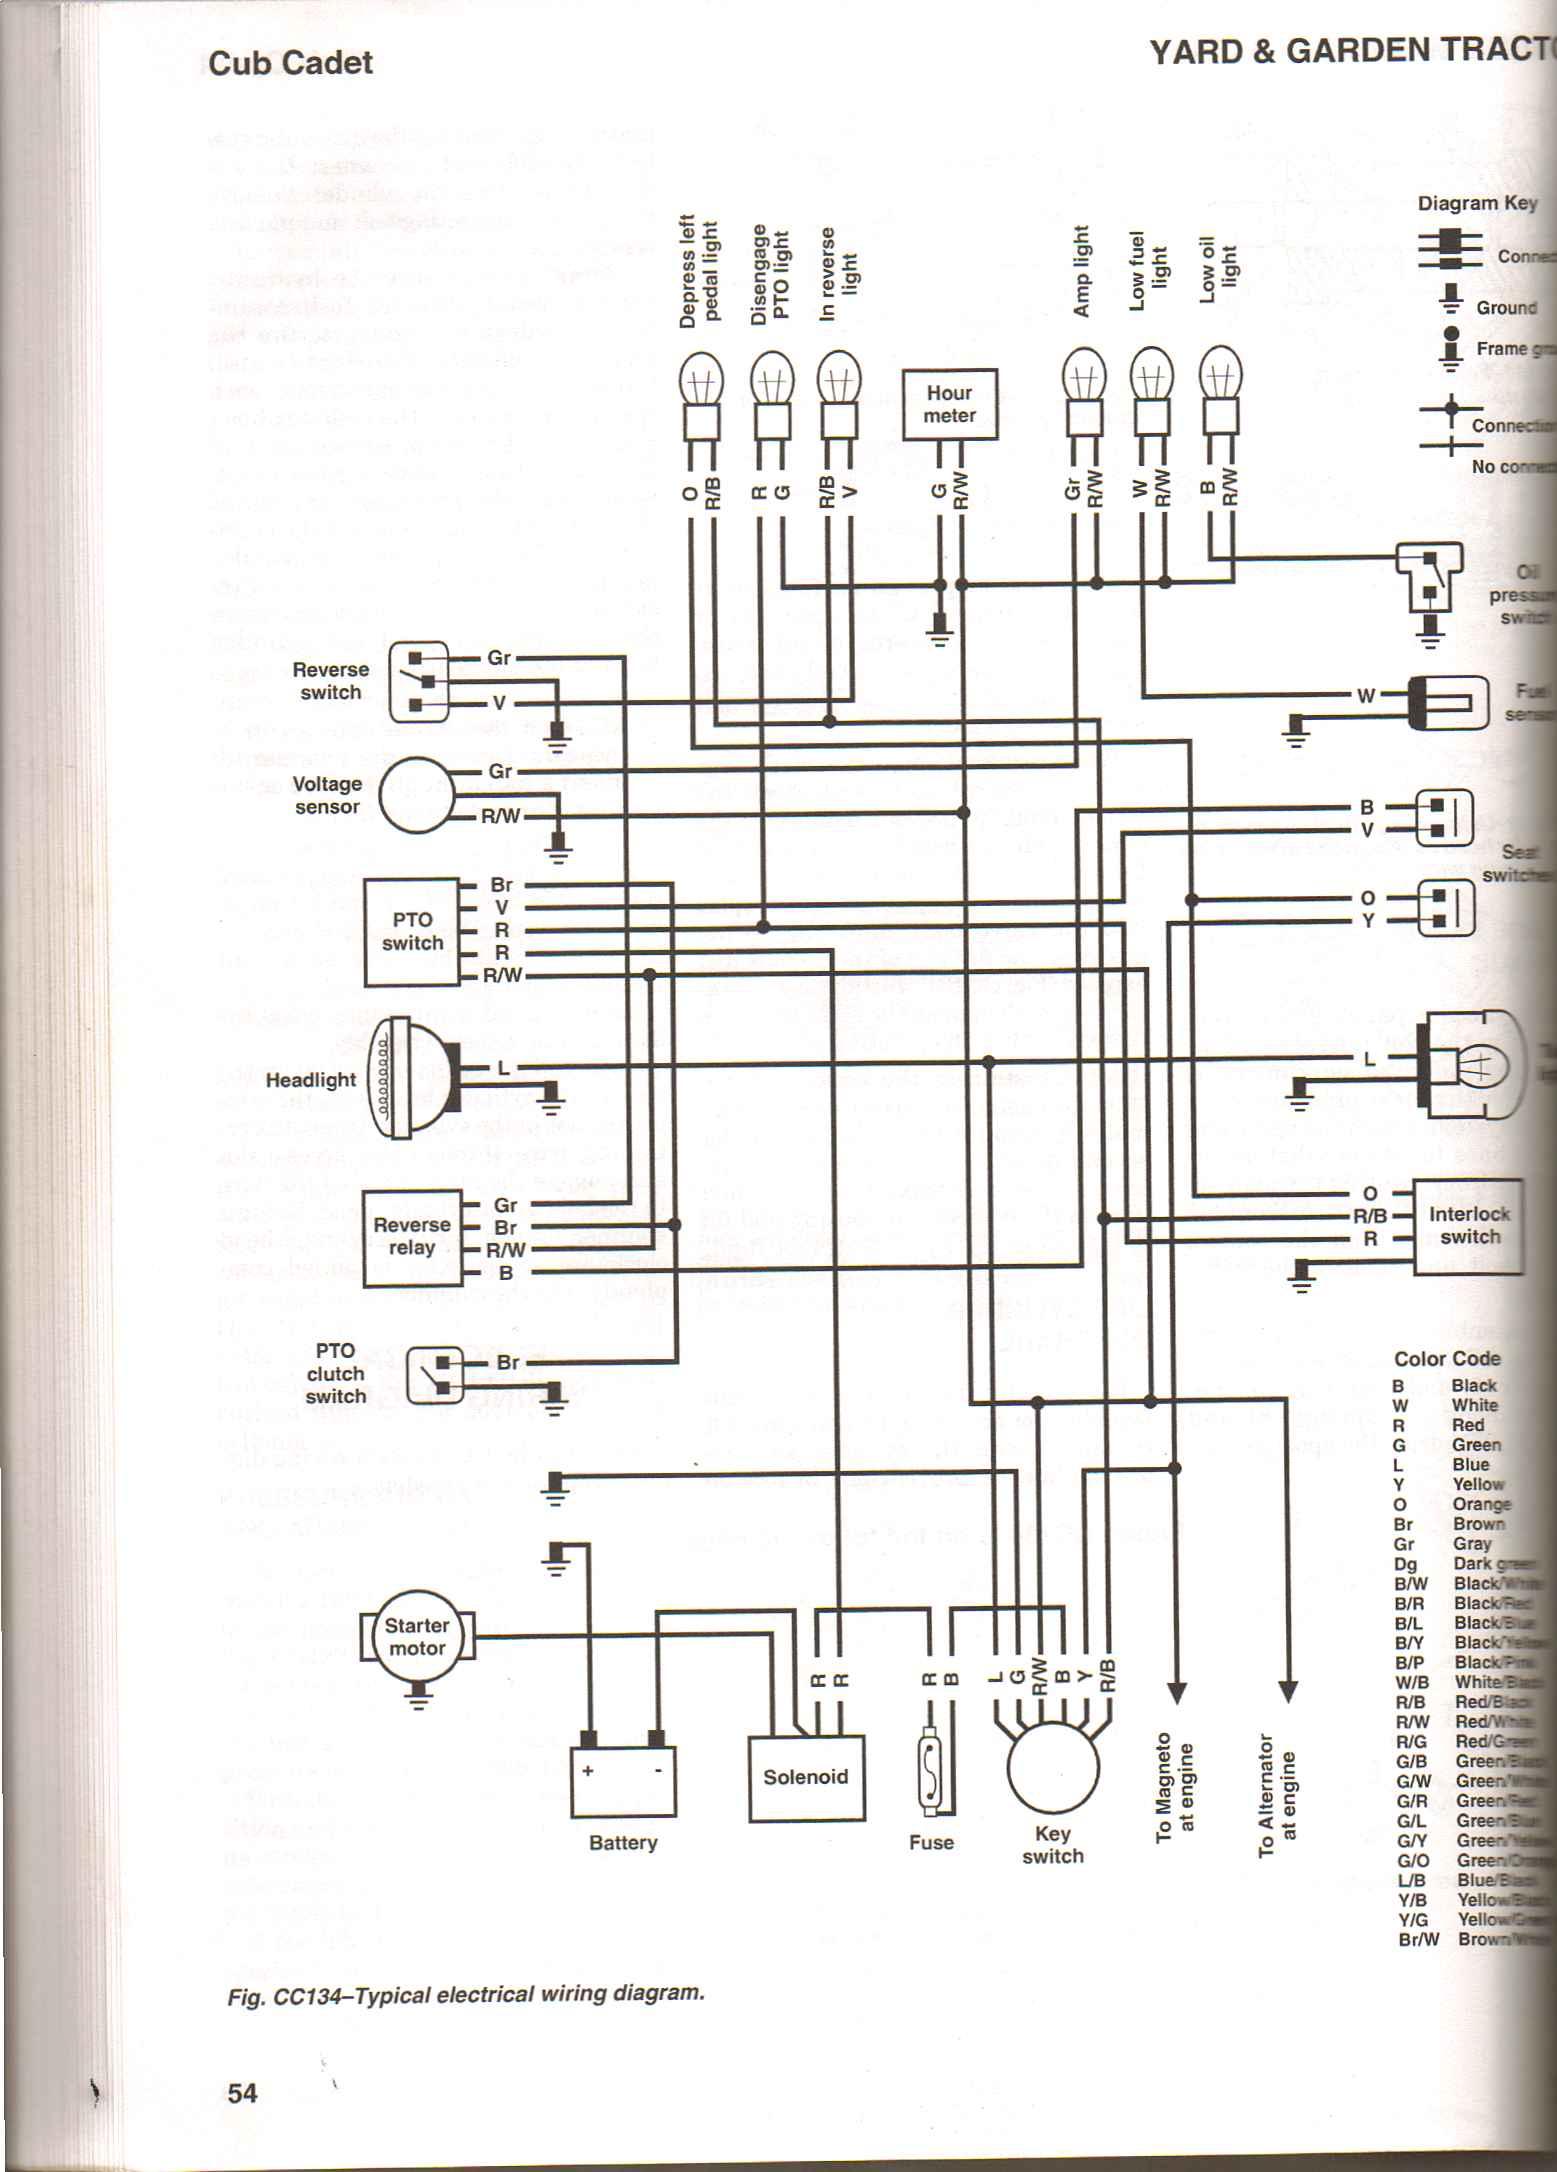 [ZHKZ_3066]  DN_4941] Cub Cadet Wiring Diagram On Wiring Diagram For A Cub Cadet Rzt 50 Wiring  Diagram | Wiring Diagram For Cub Cadet Zero Turn |  | Xlexi Rous Oxyt Pap Mohammedshrine Librar Wiring 101